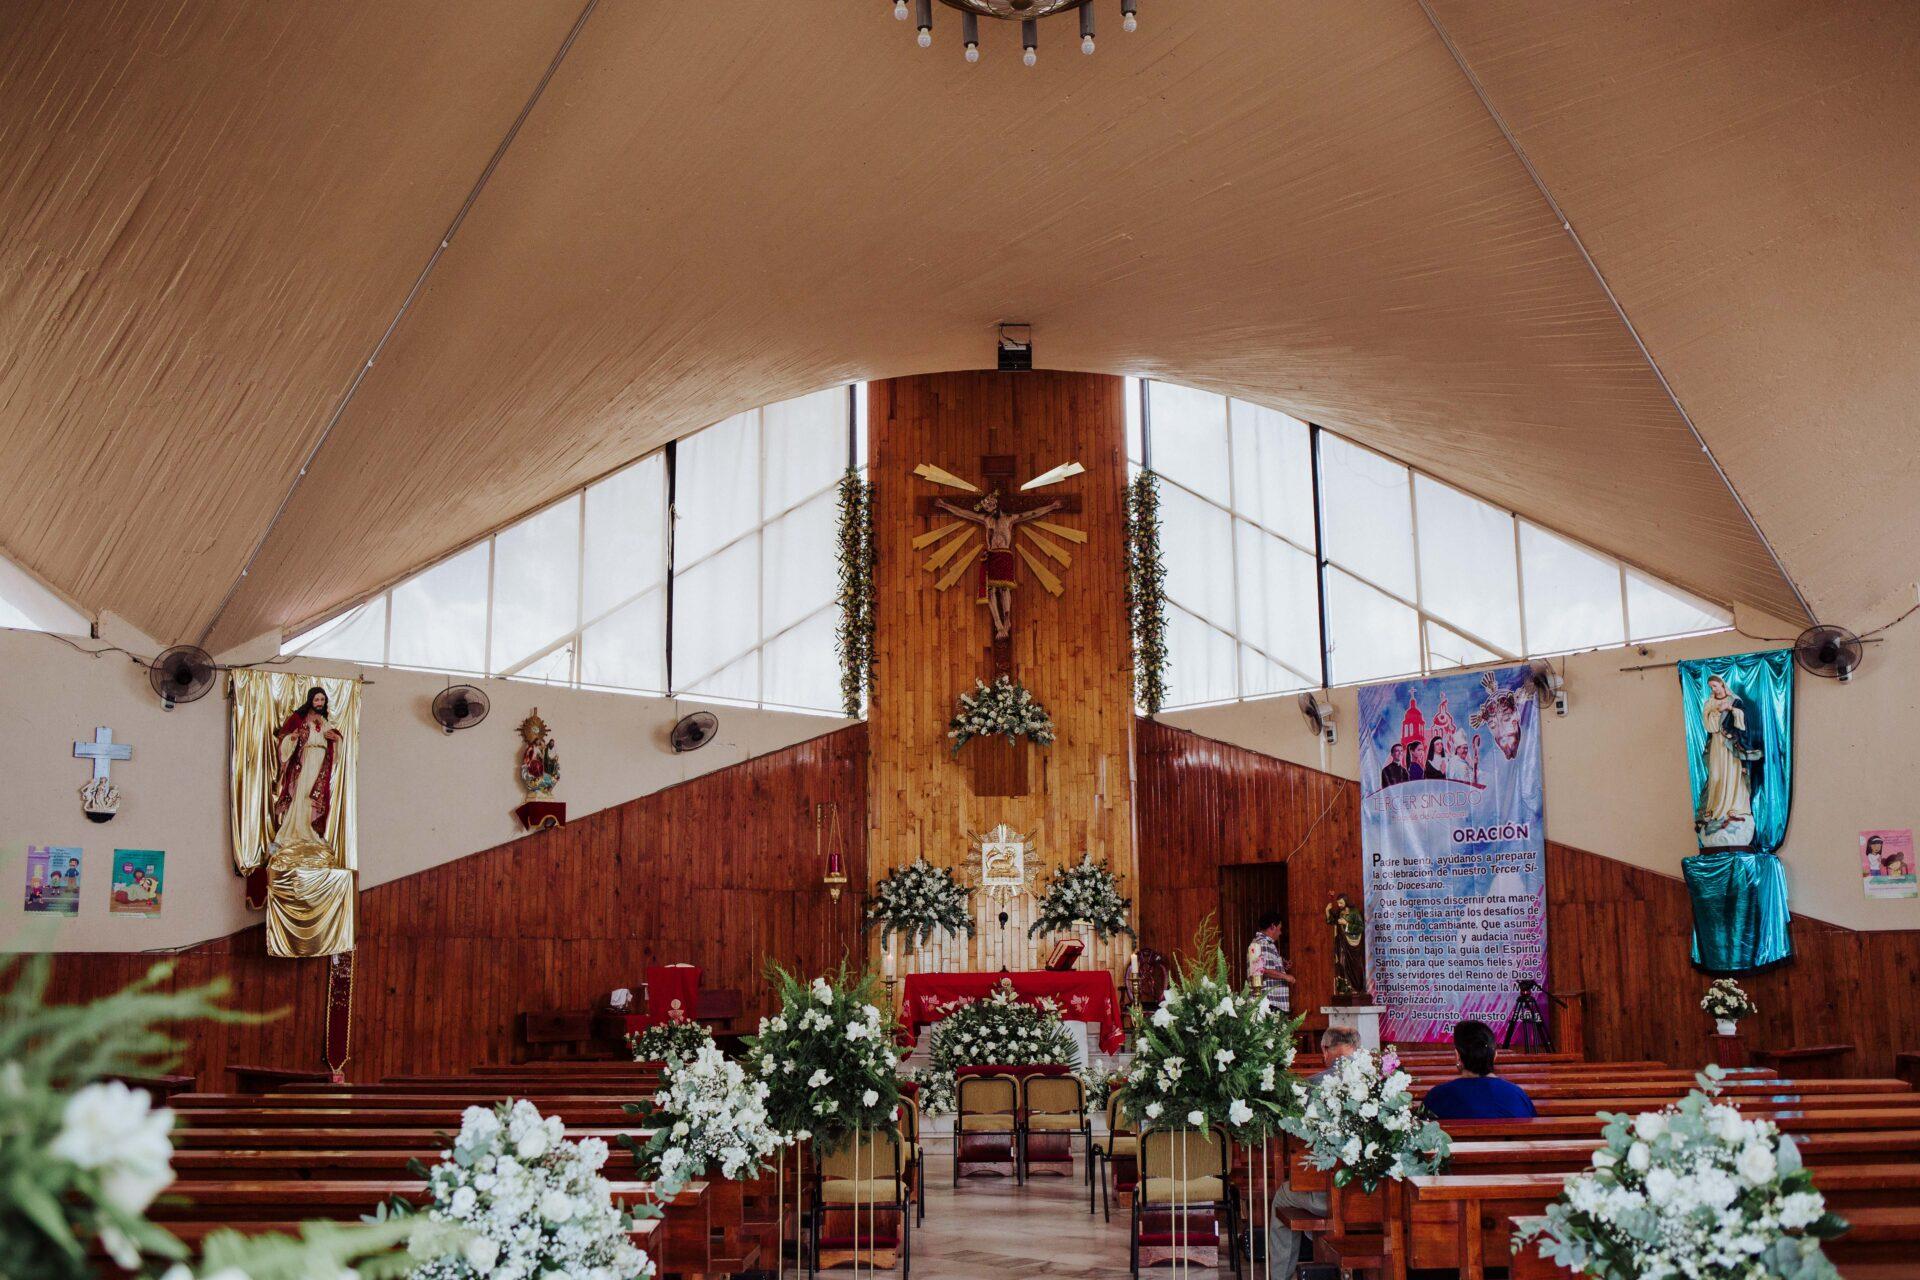 javier_noriega_fotografo_bodas_zacatecas_fresnillo_chihuahua_wedding_photographer4